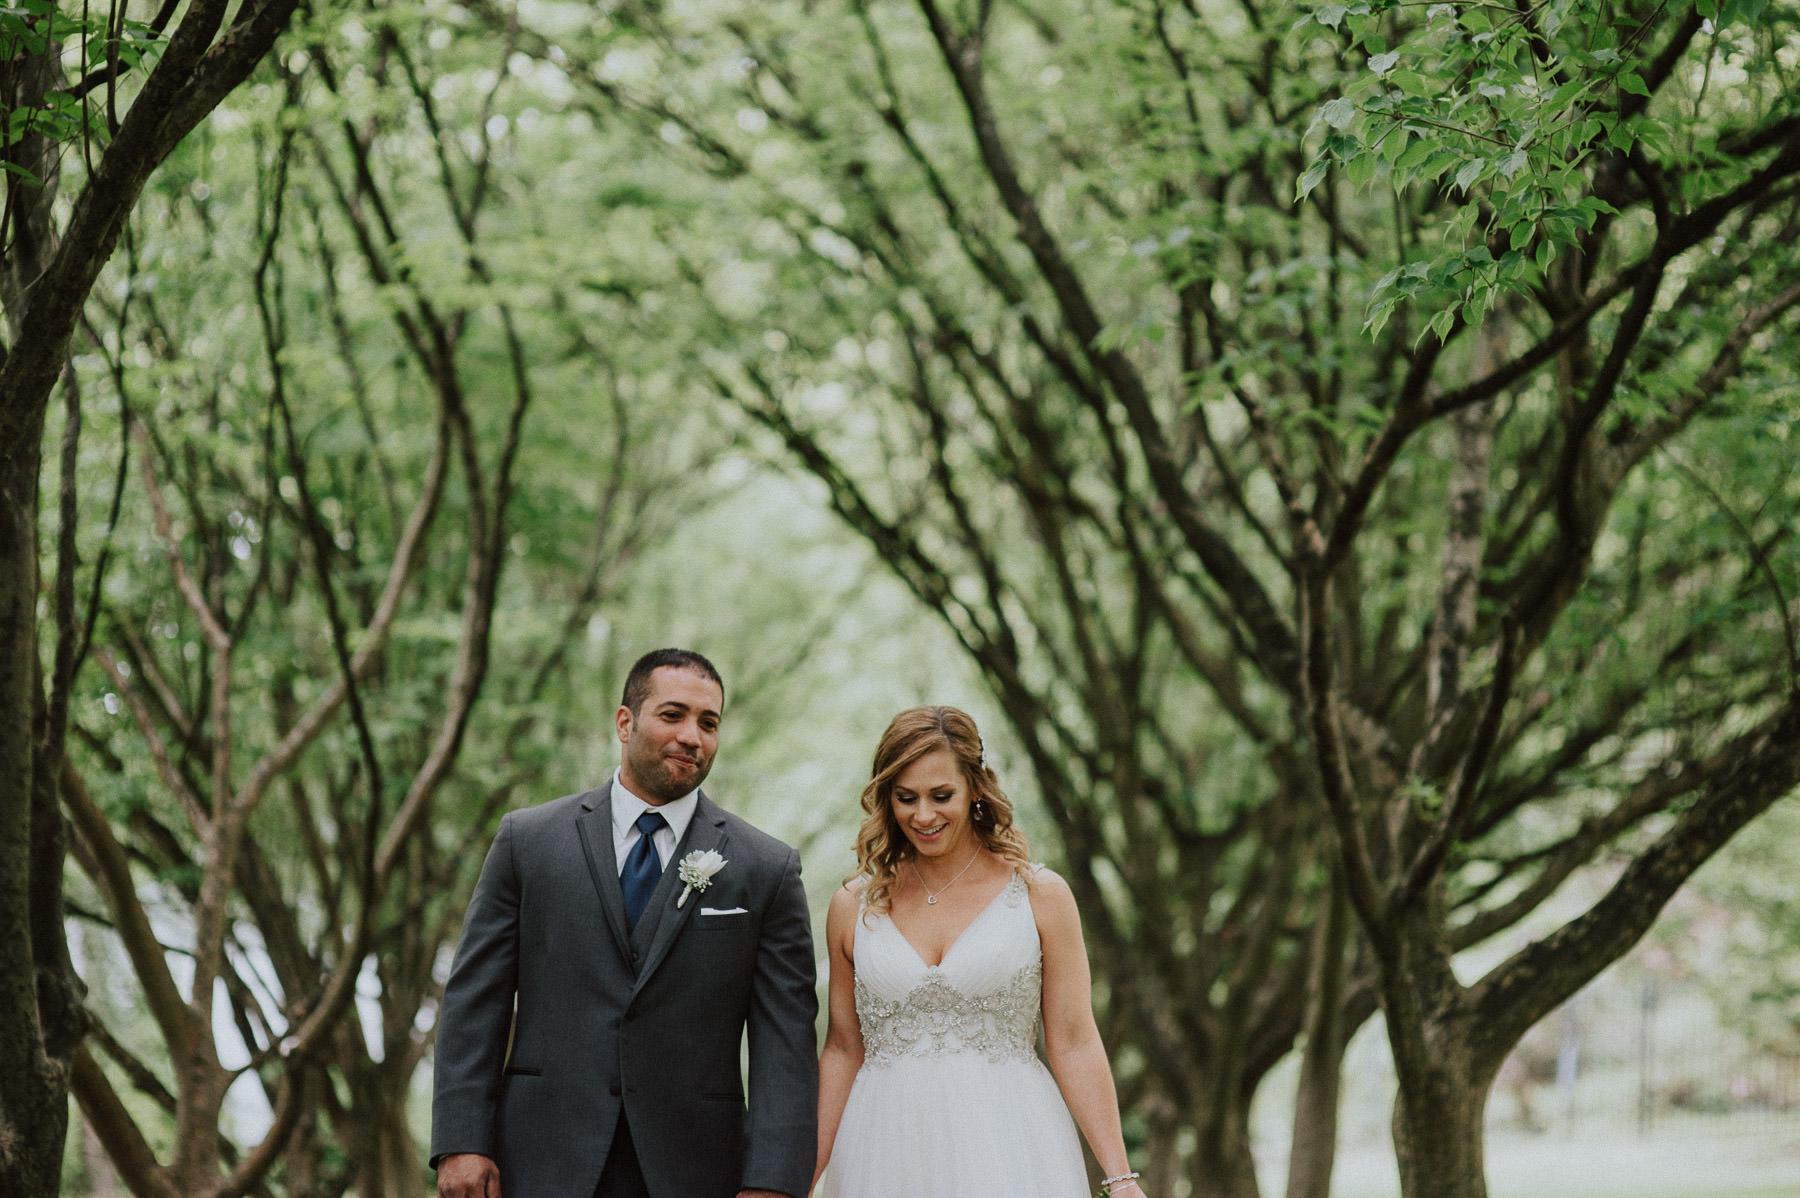 appleford-estate-wedding-photography-48.jpg